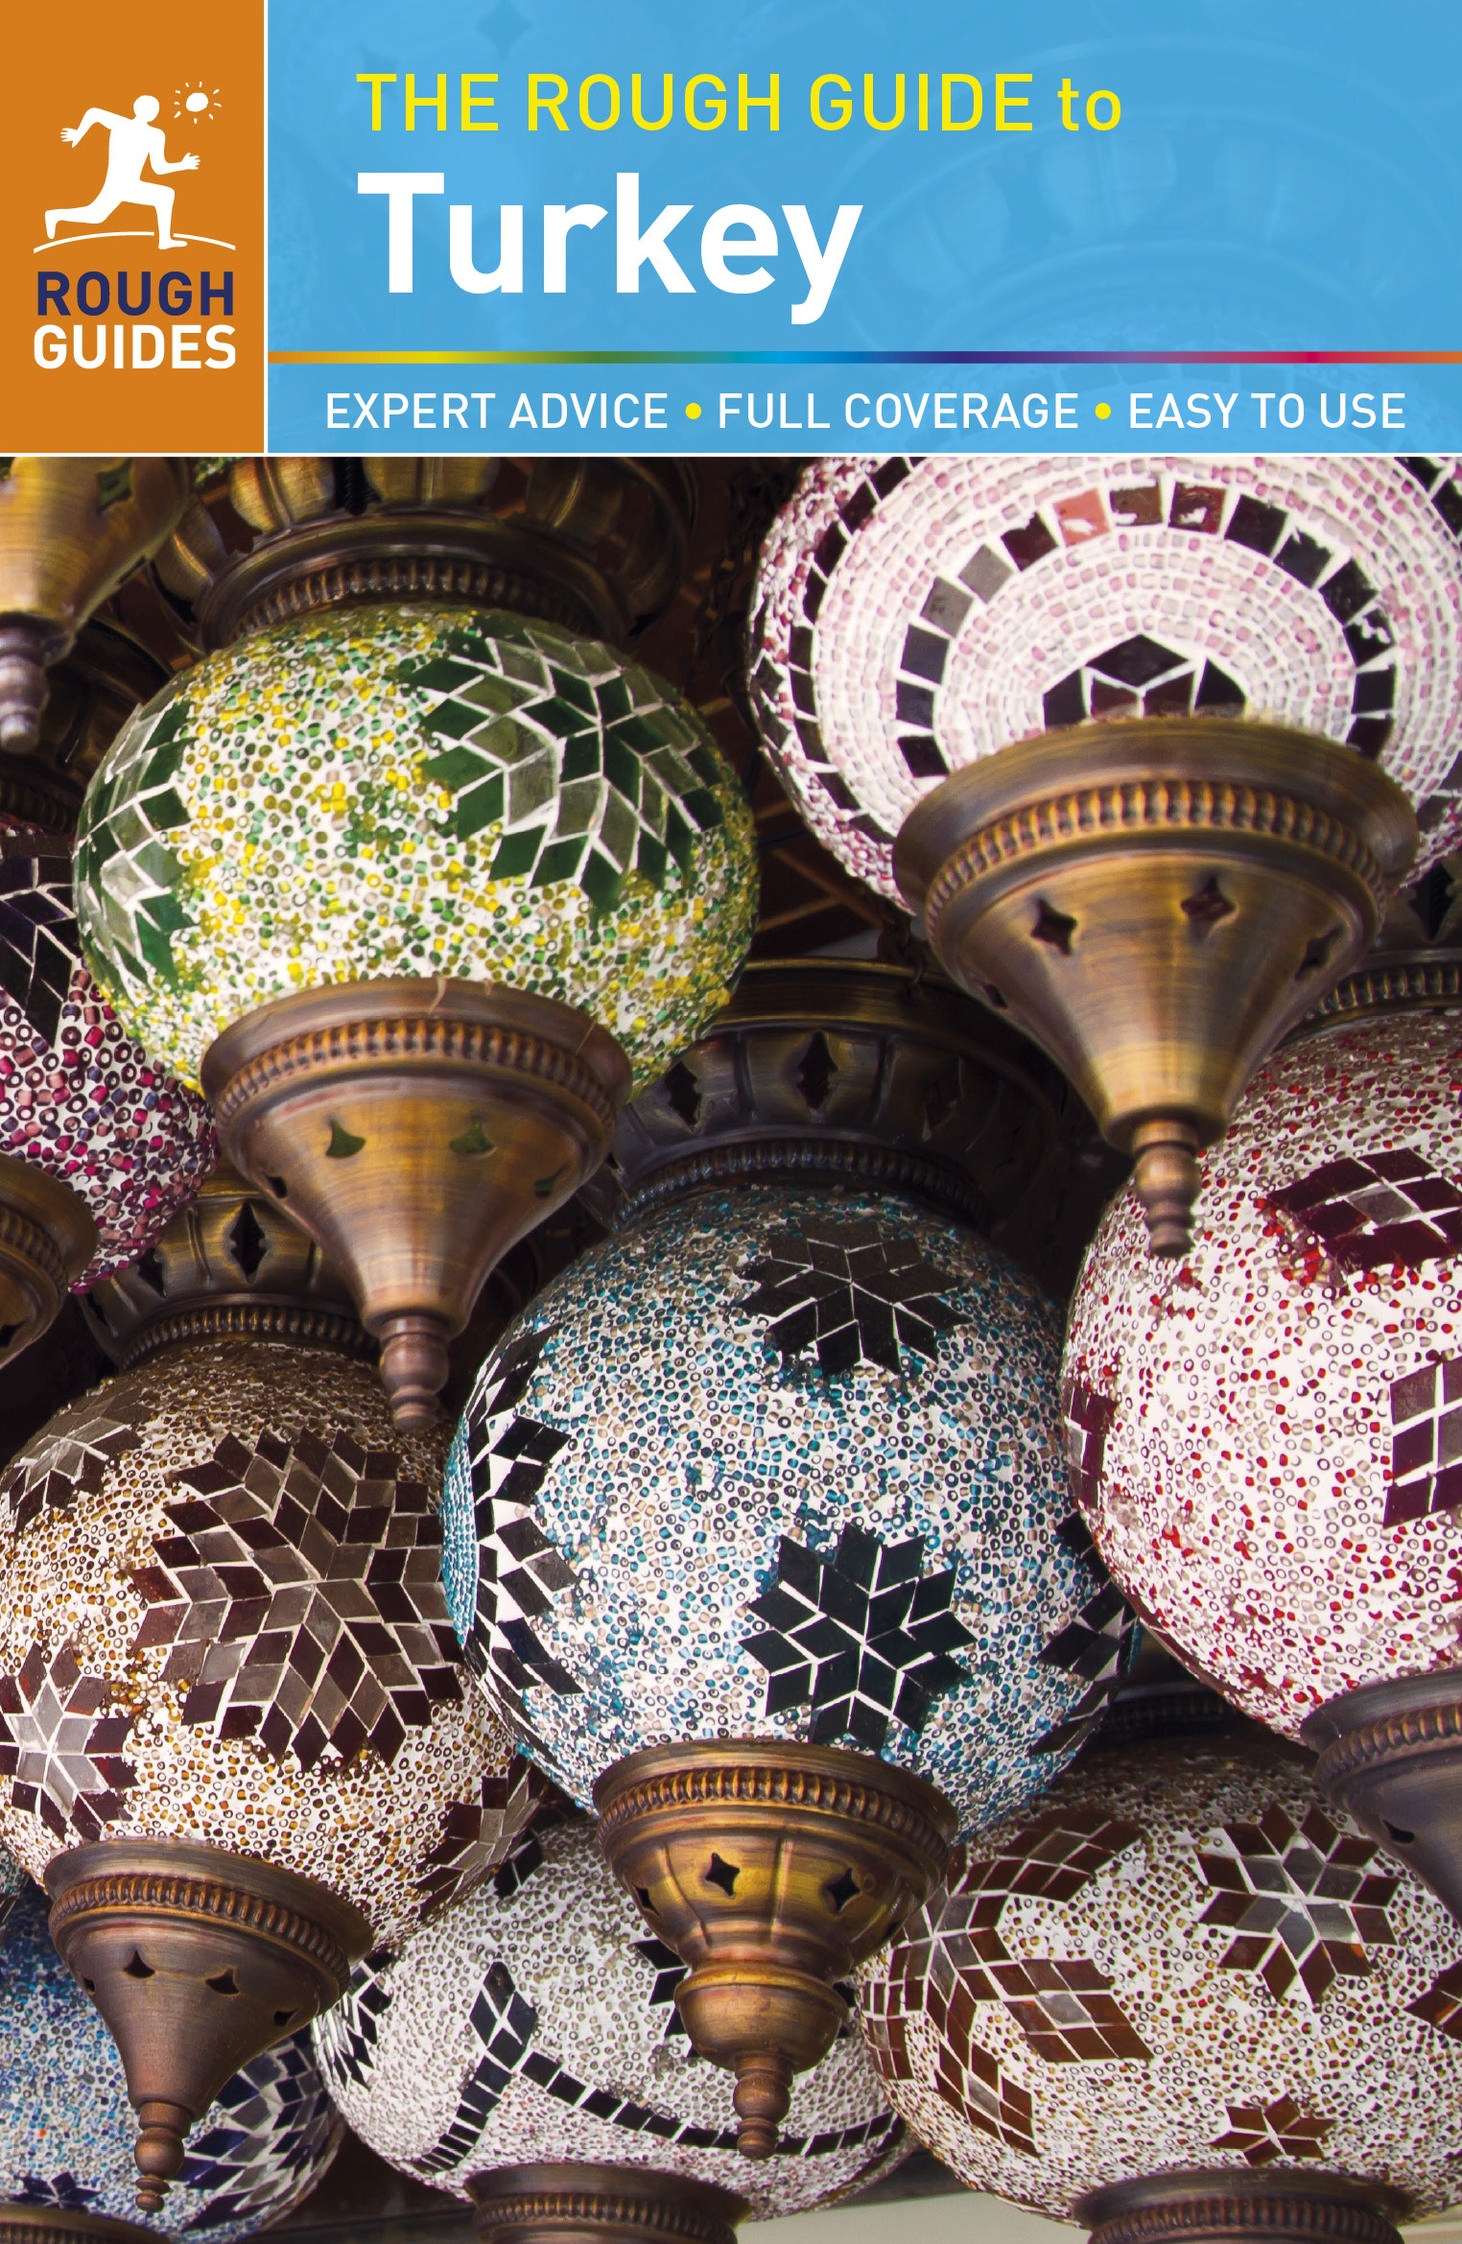 Reisgids Rough Guide Turkey - Turkije   Rough guide